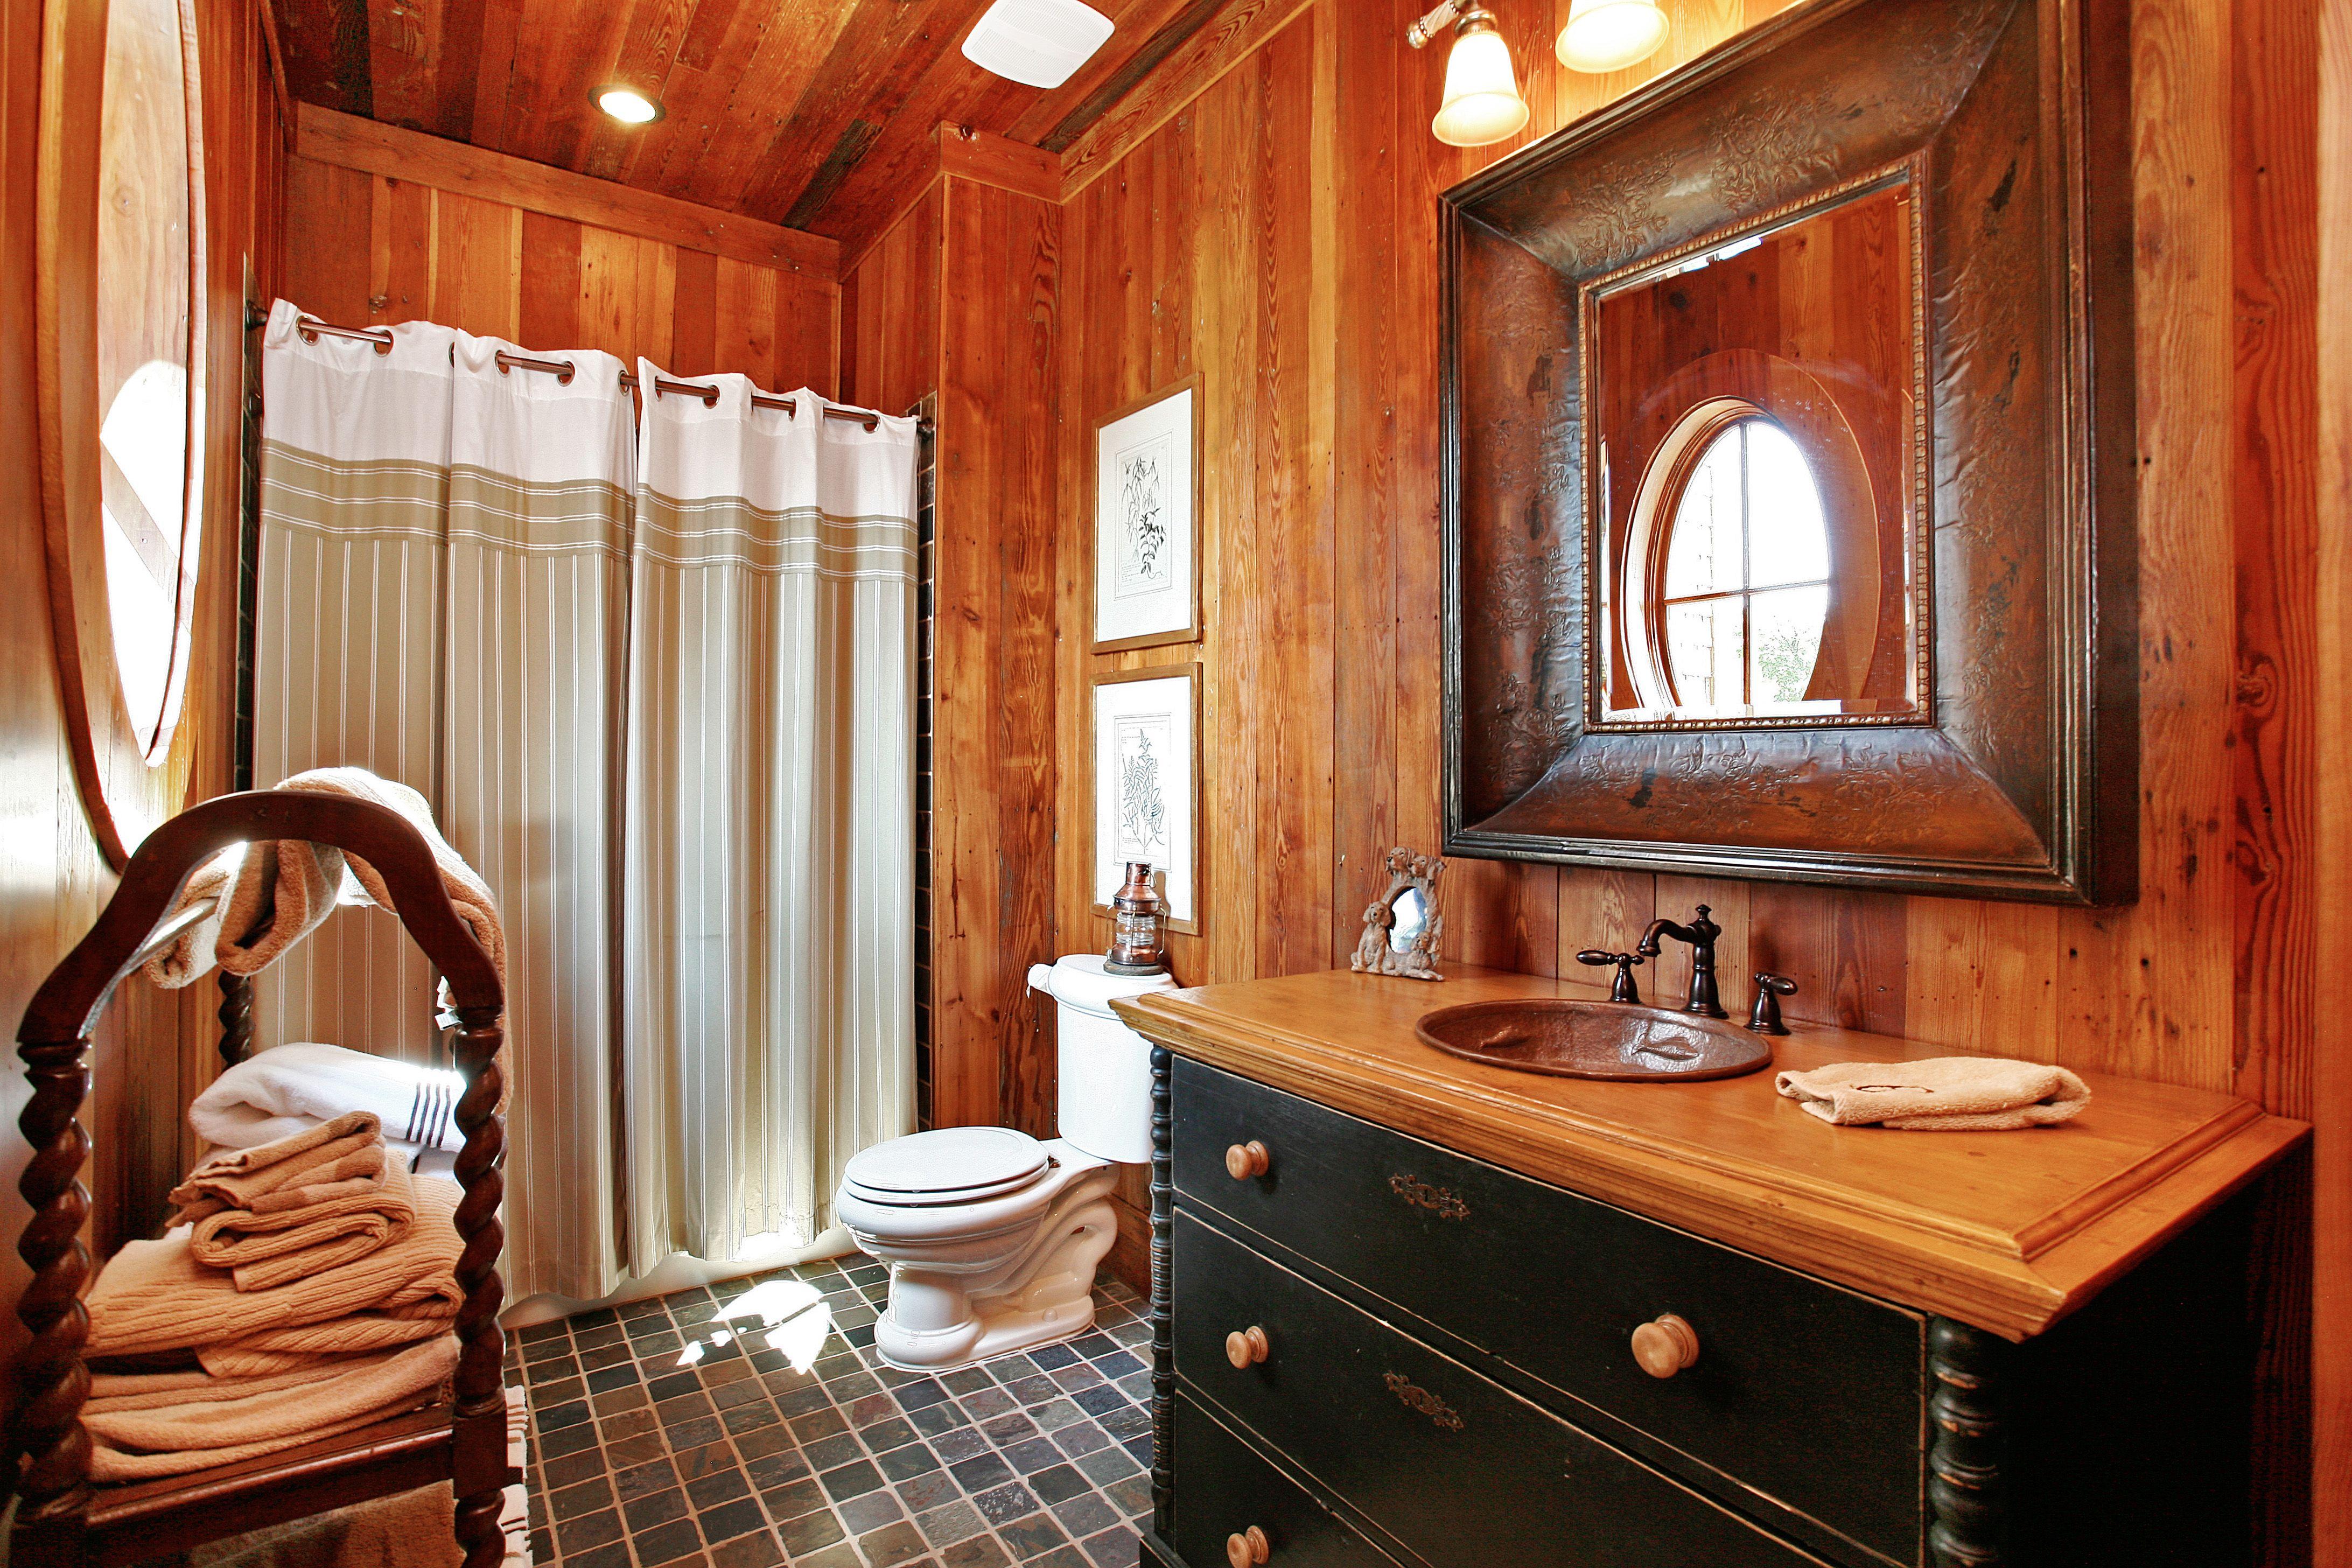 Western Style Bathroom With The Most Rustic Bathroom Vanities